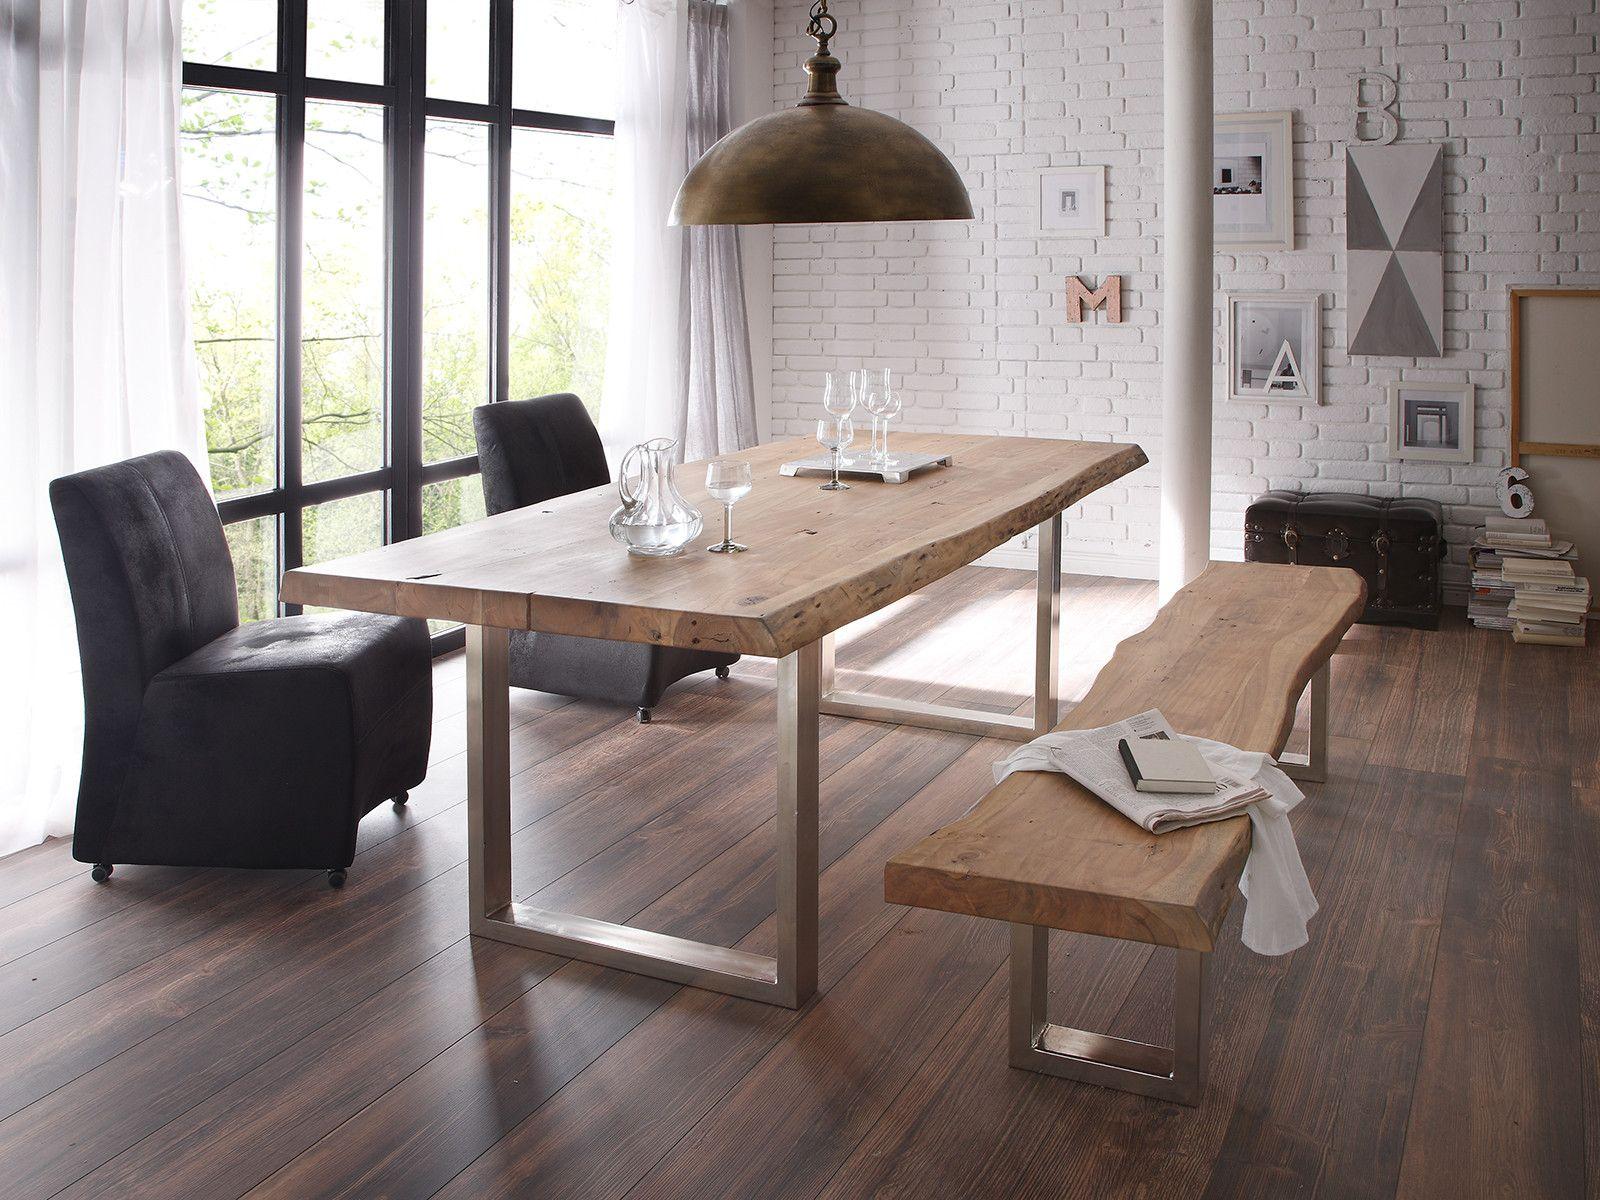 Baumtisch Kenai Ii Baumtisch Haus Deko Baumkantentisch